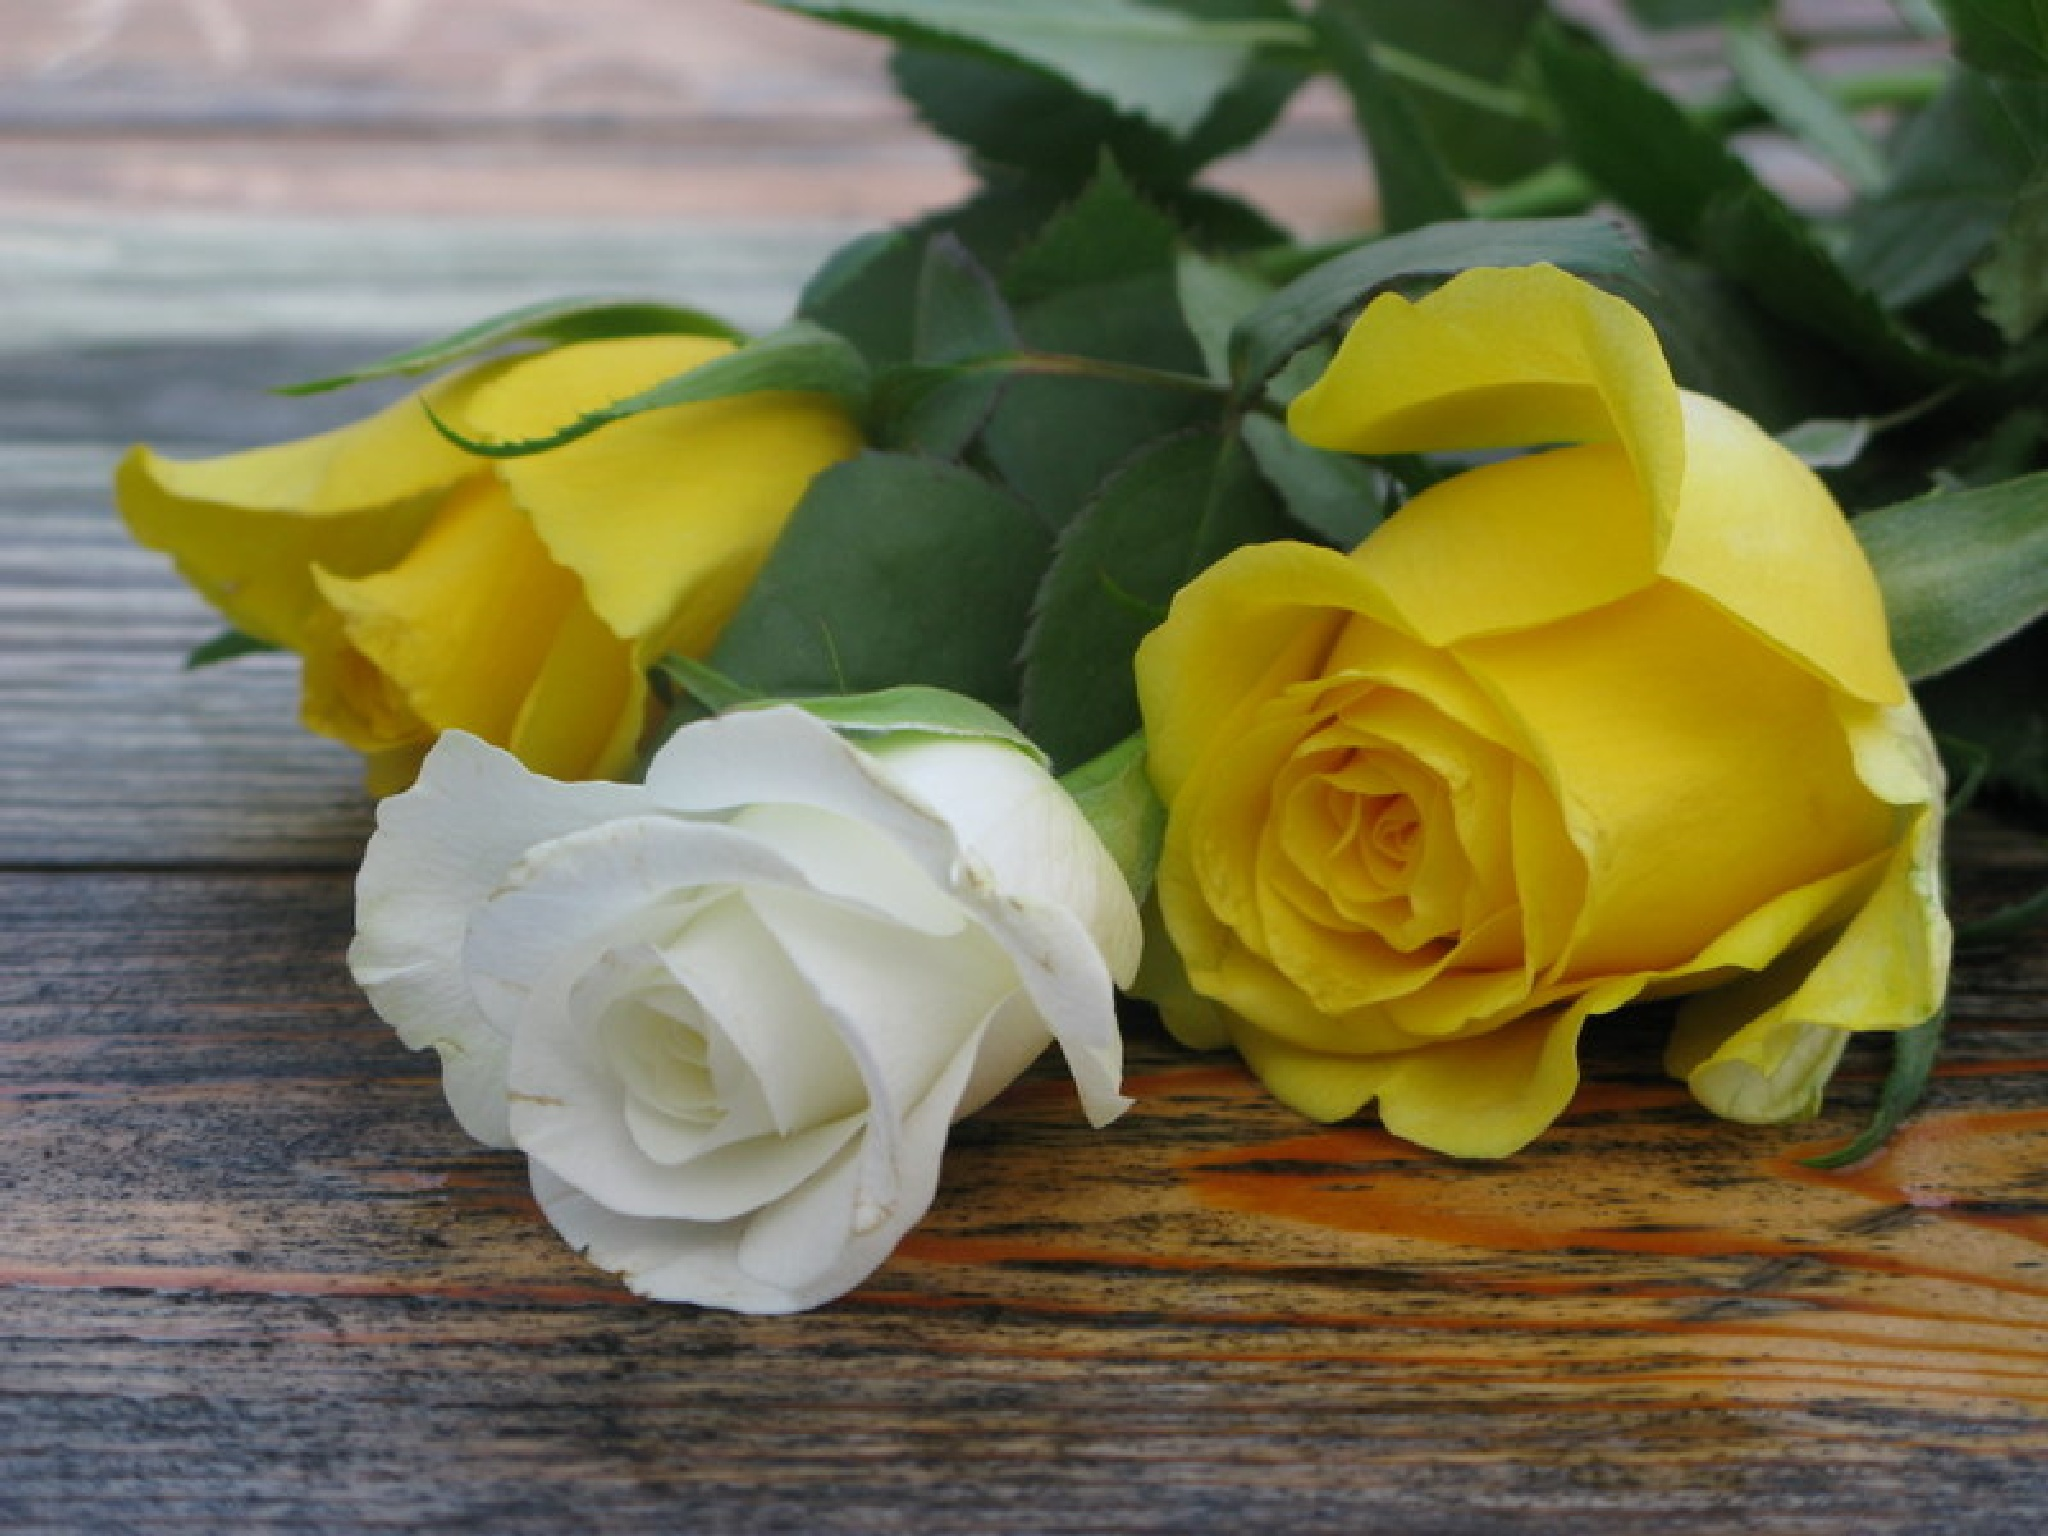 White and yellow by Ela Gajowska